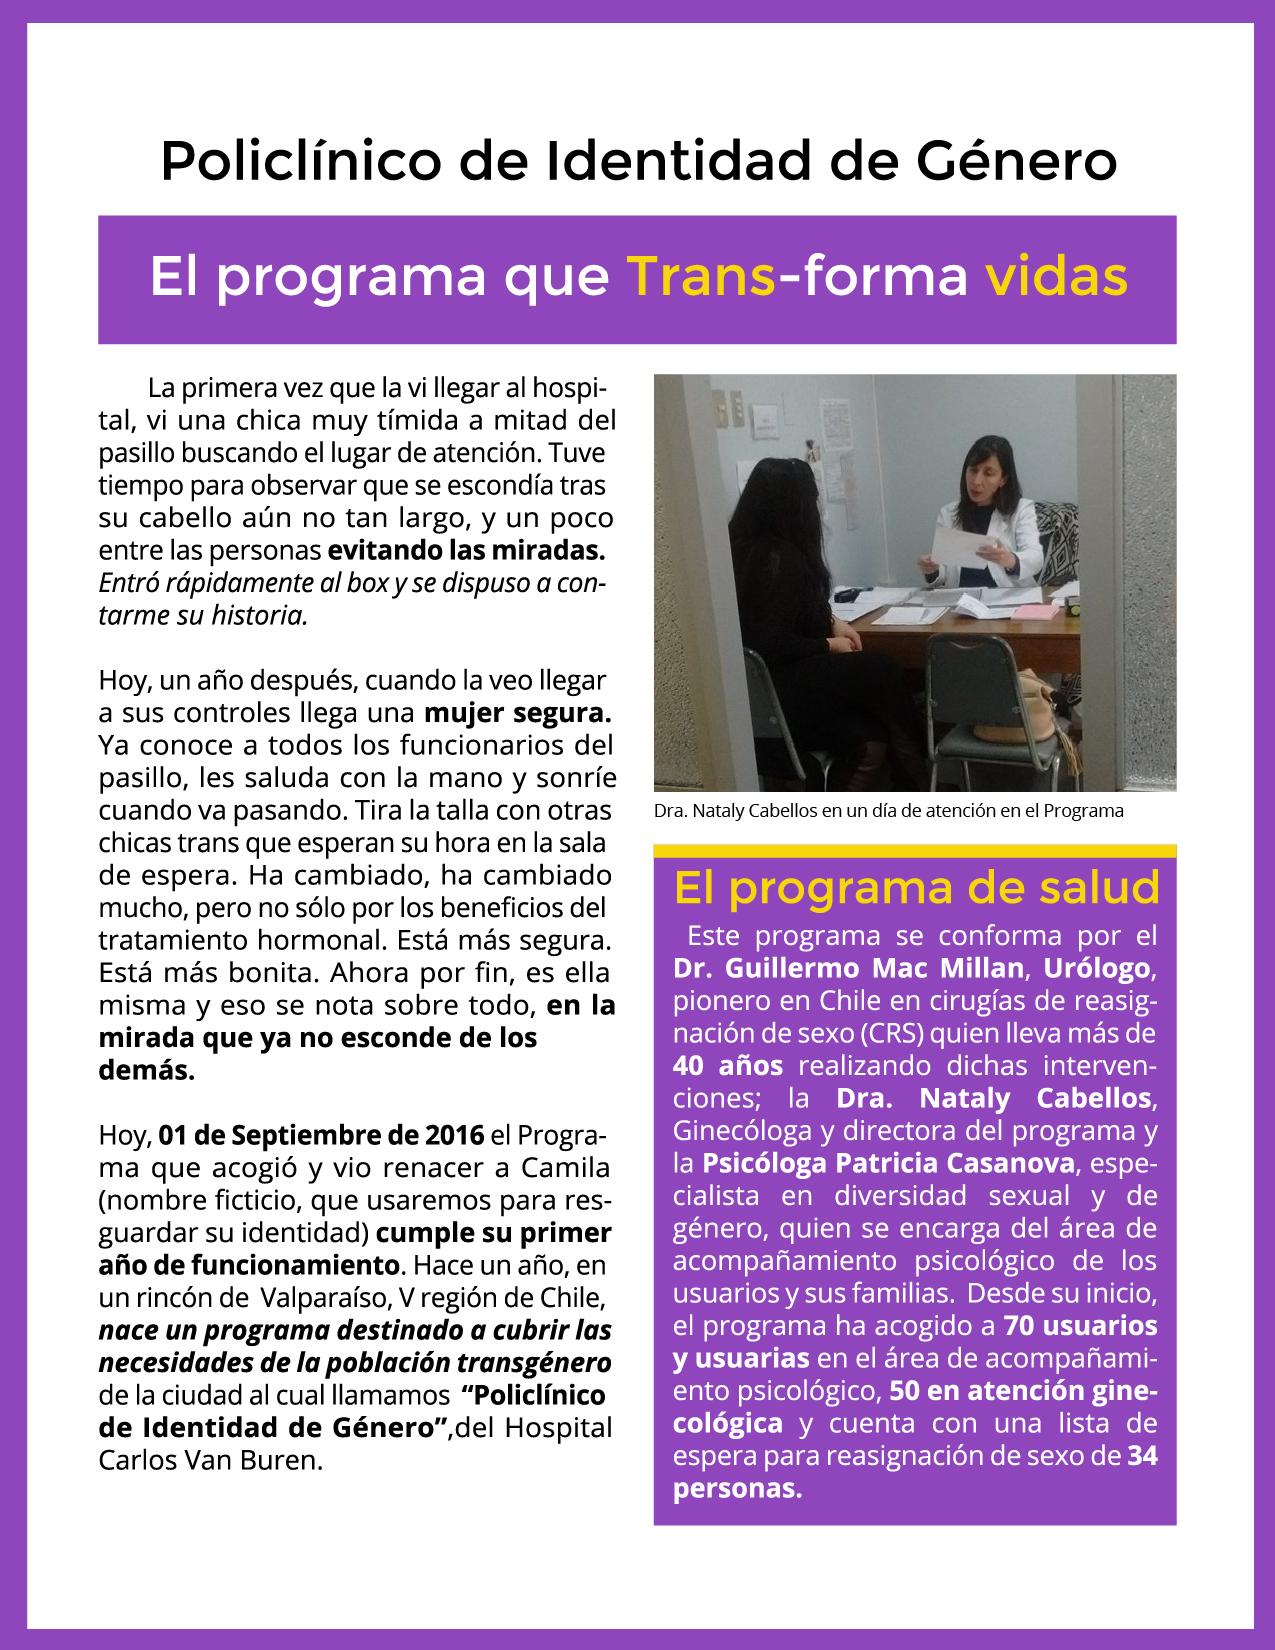 Primer año del Policlínico Trans HCVB